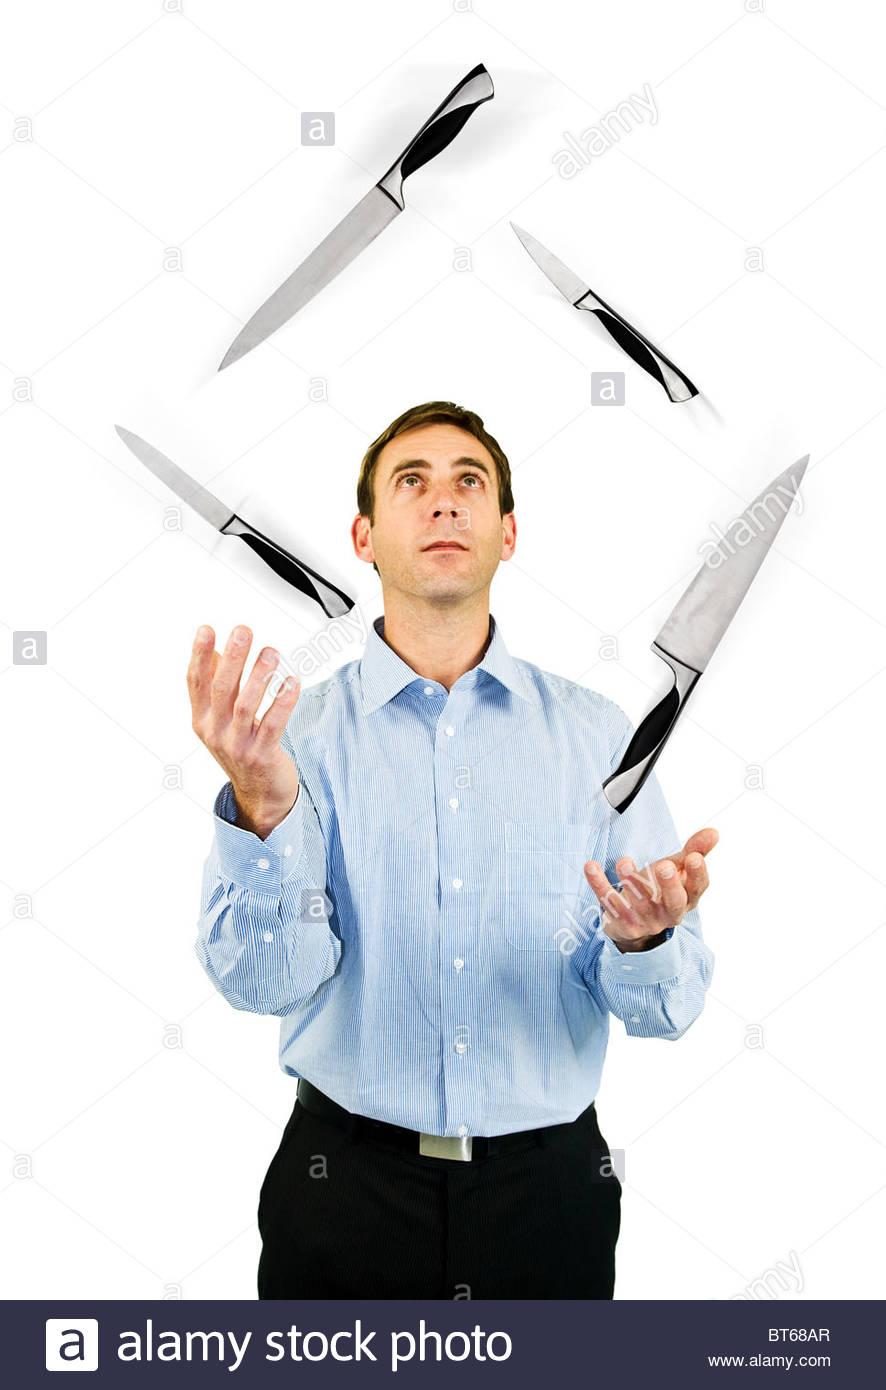 Juggling knives - Stock Image